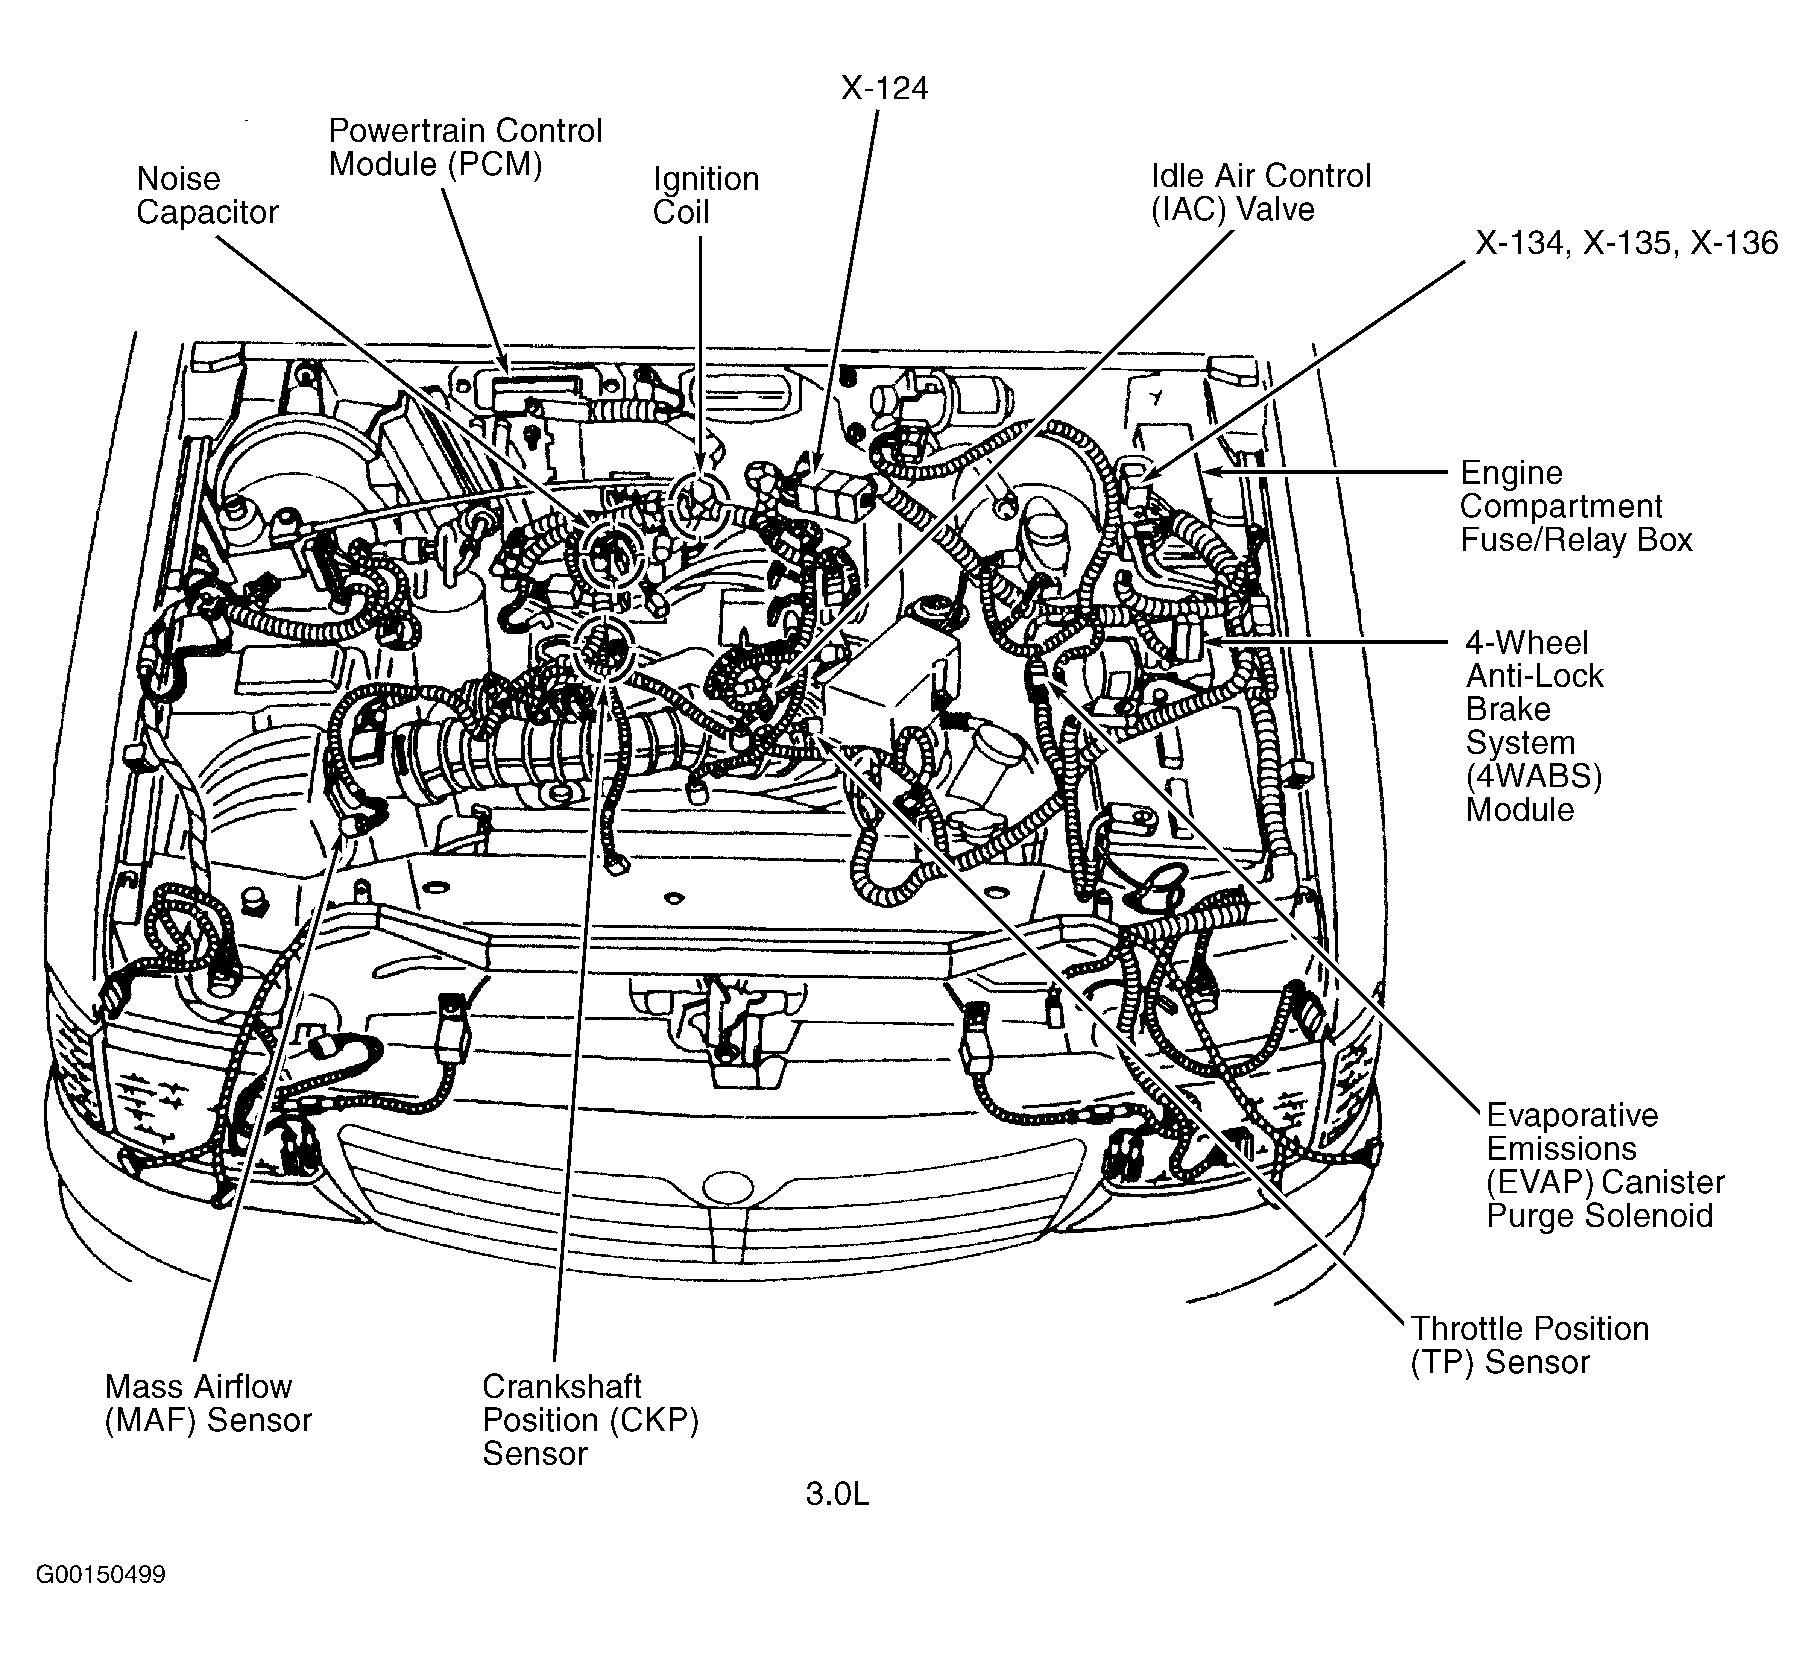 1995 toyota Camry Parts Diagram 1988 toyota Engine Parts Diagram Wiring Diagram toolbox Of 1995 toyota Camry Parts Diagram